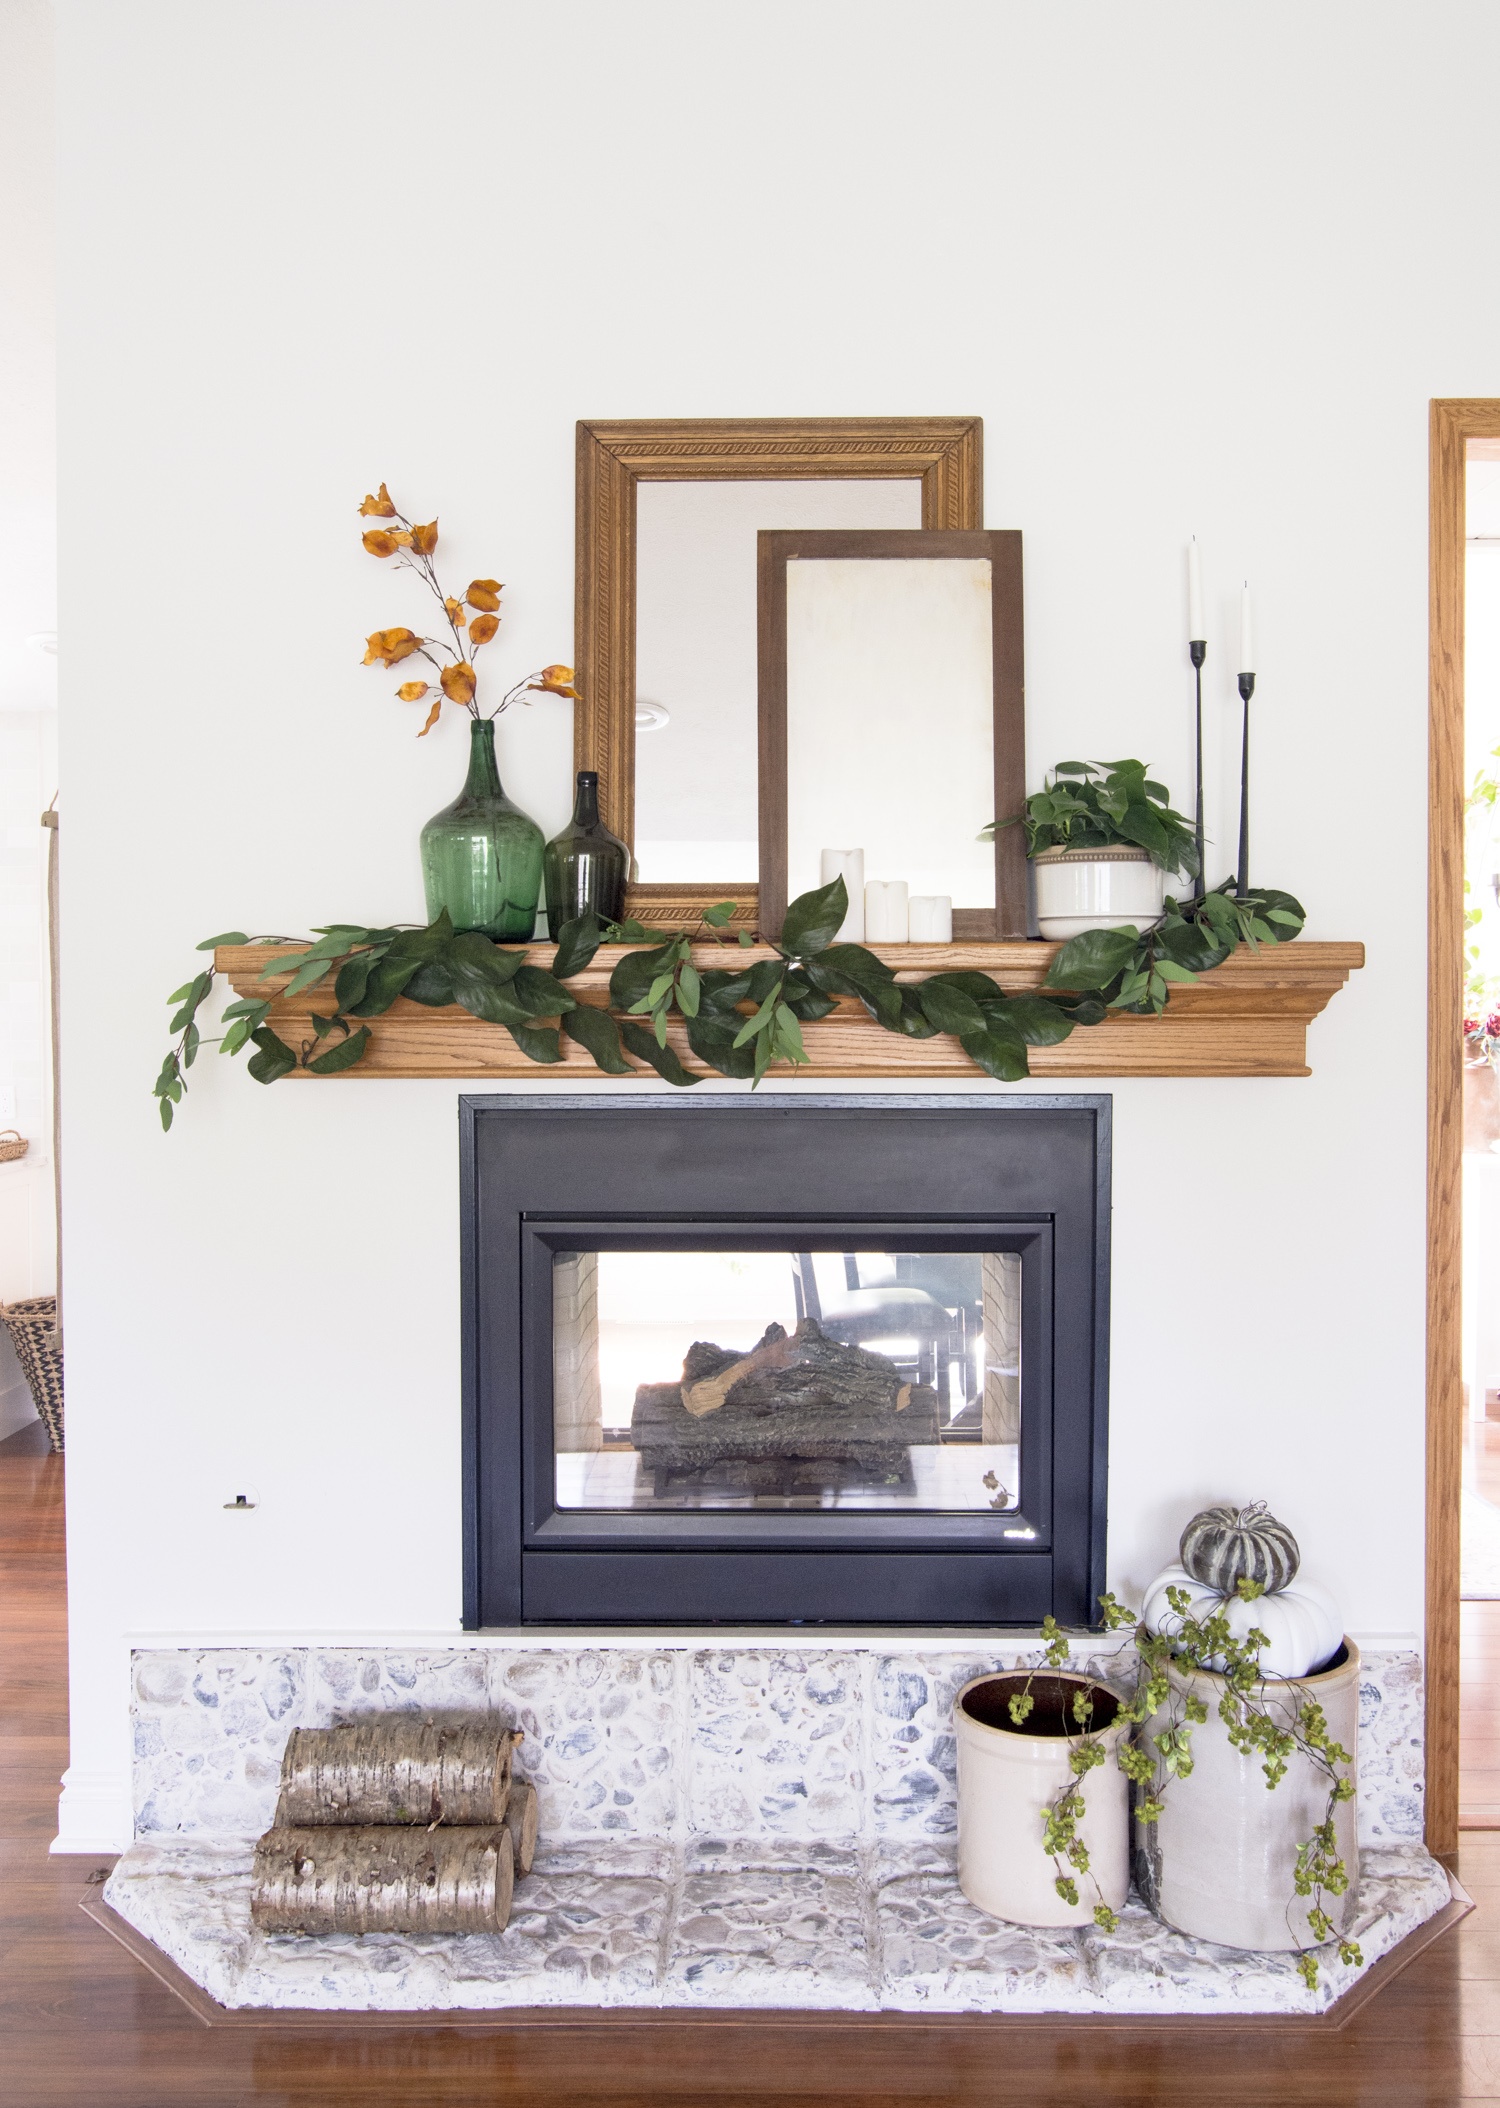 mantel decor ideas for fall